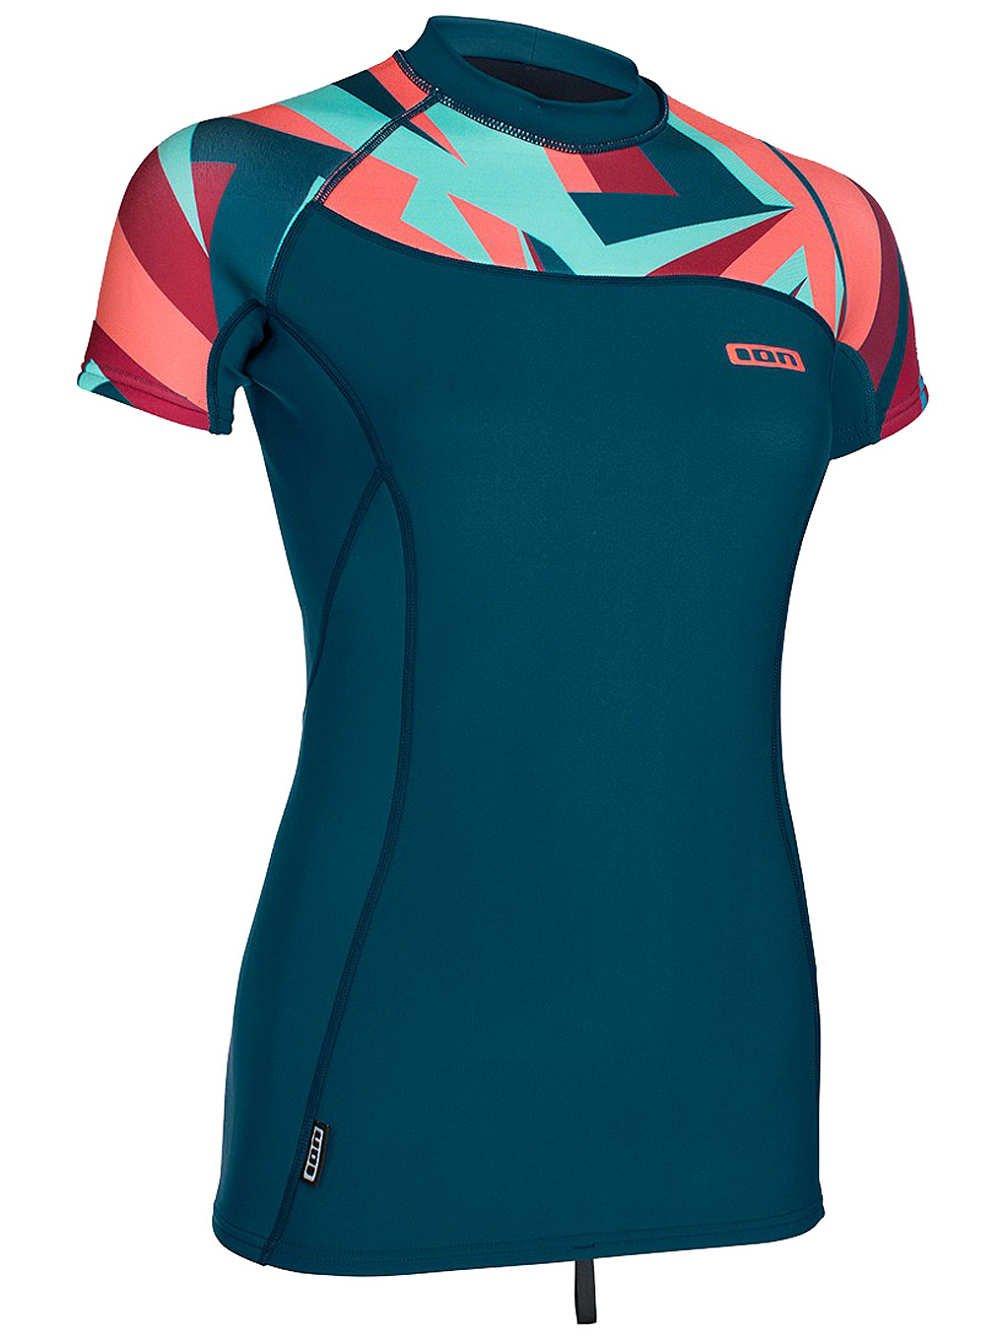 (38M) EU ION Neo Top Femme 2 1 mm SS T-Shirt néoprène Top